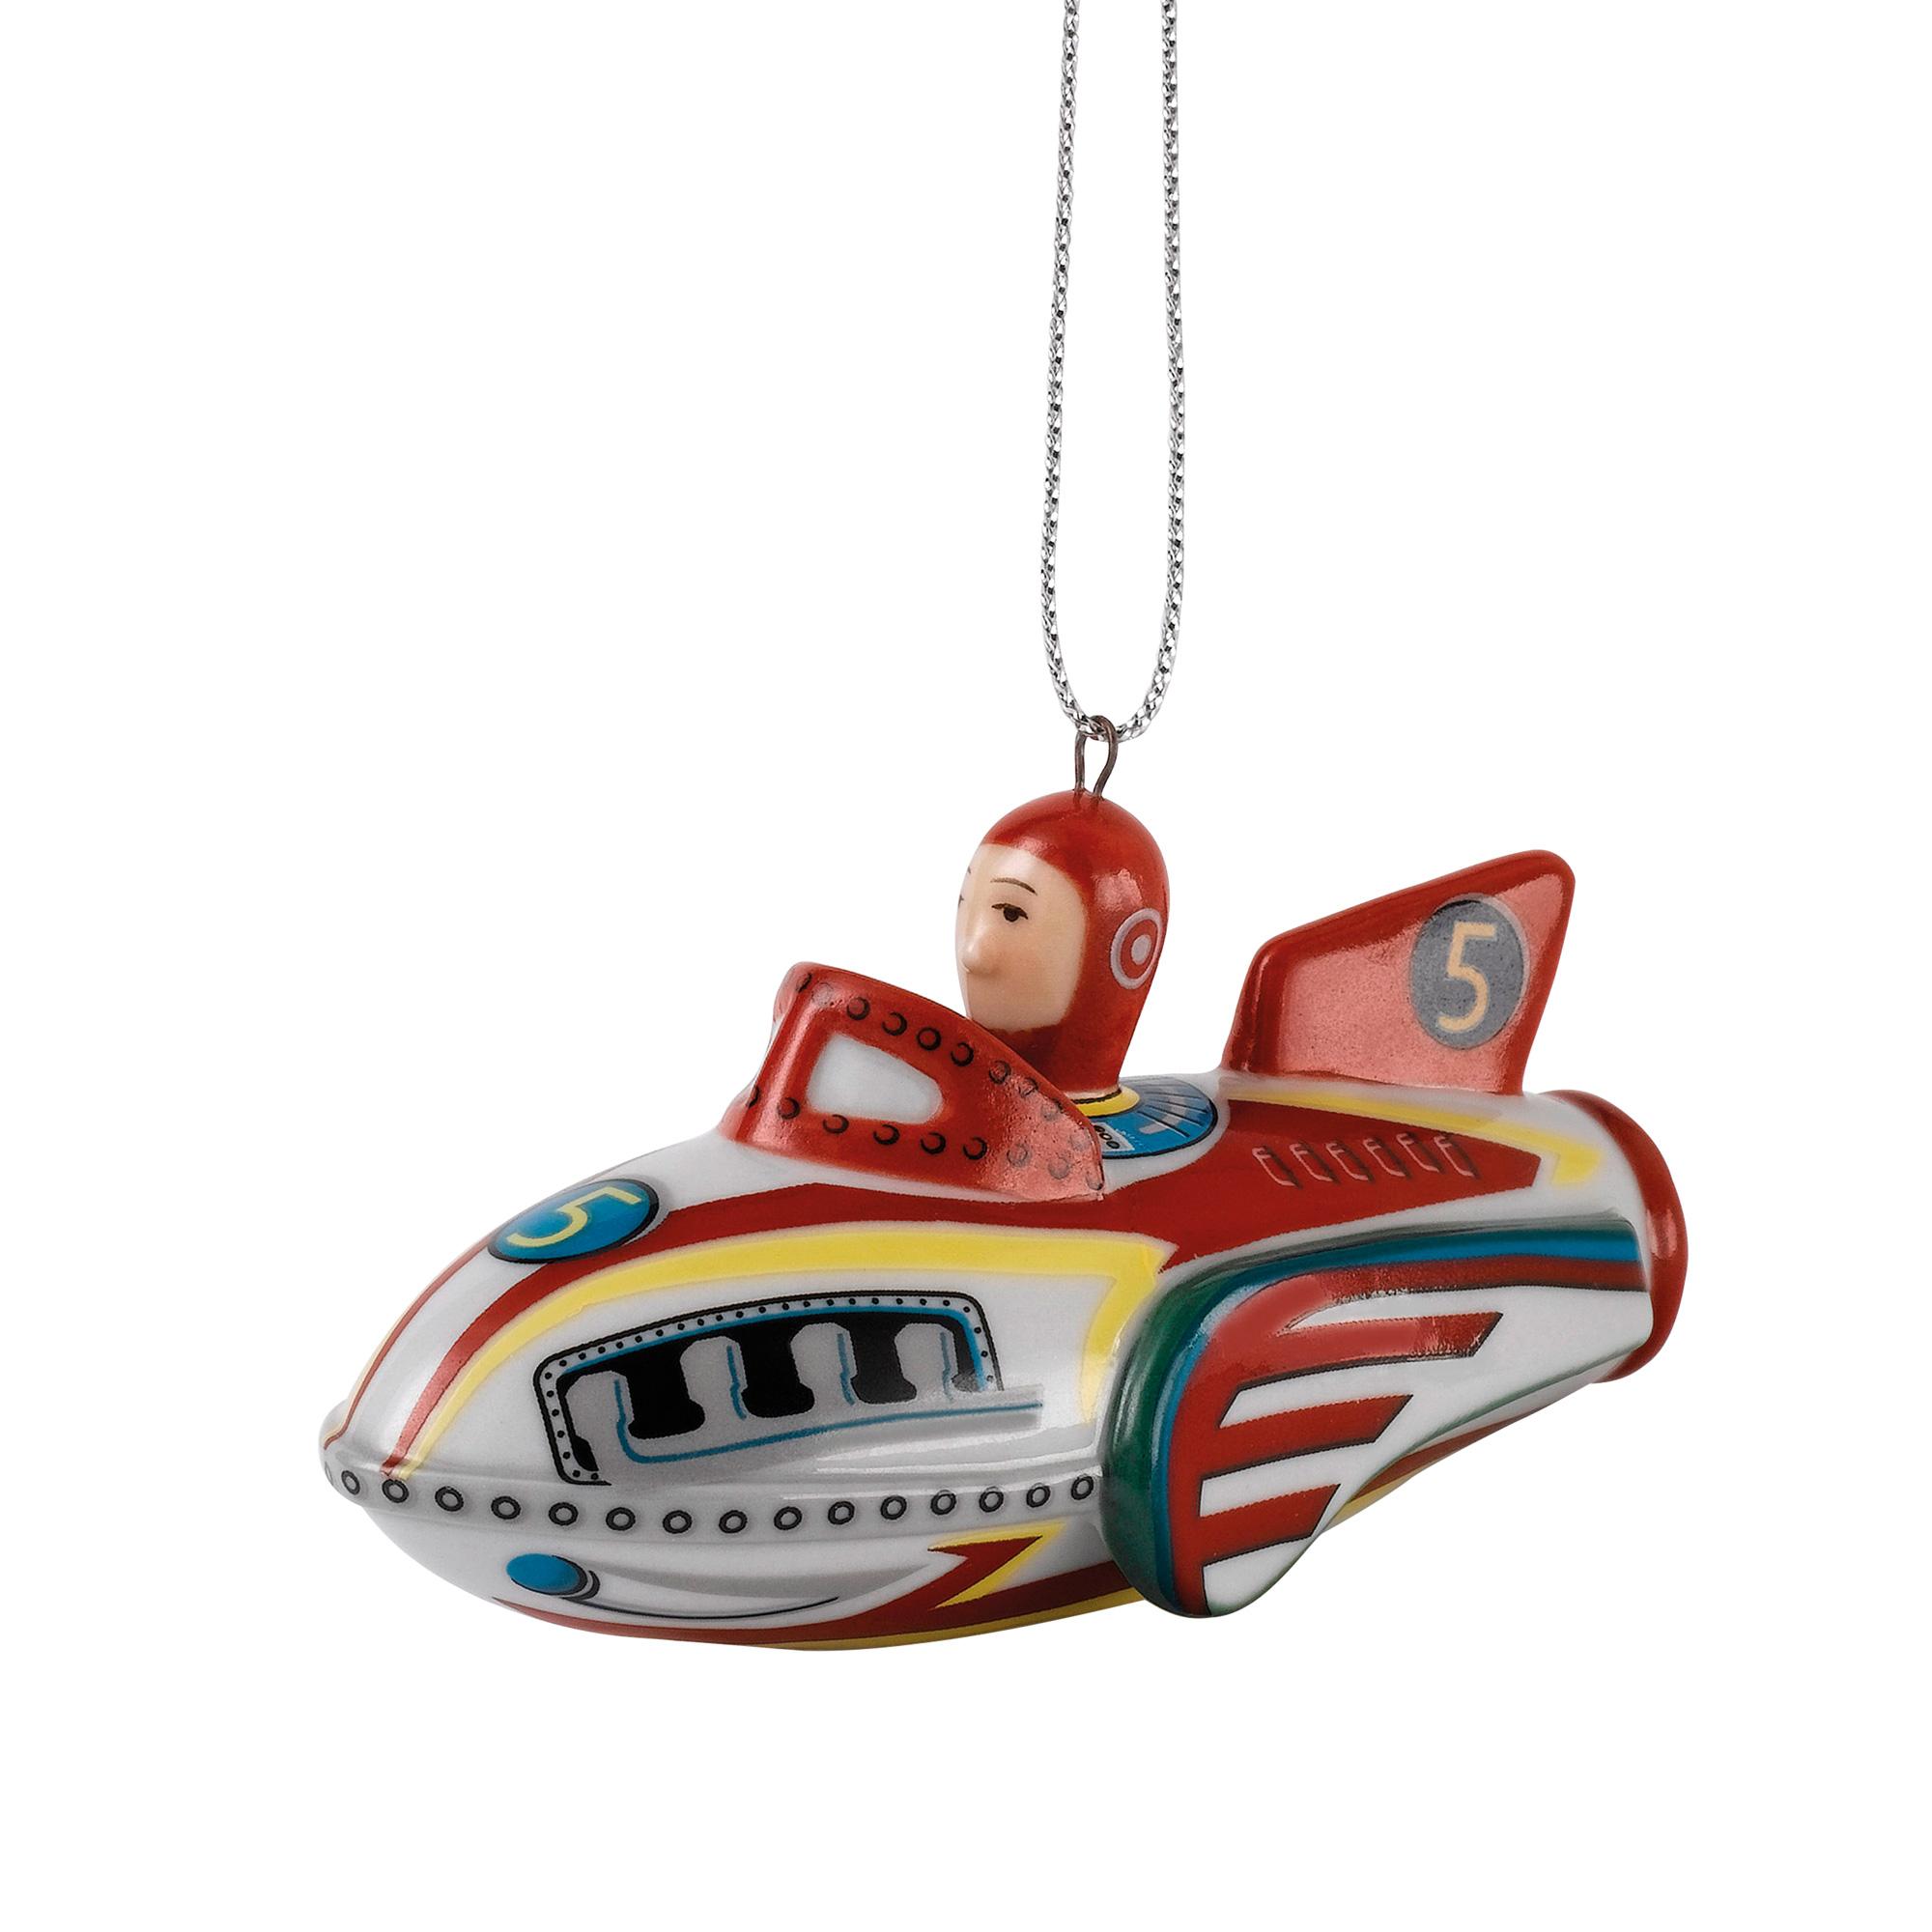 Rocket Ornament - Royal Doulton Ornament